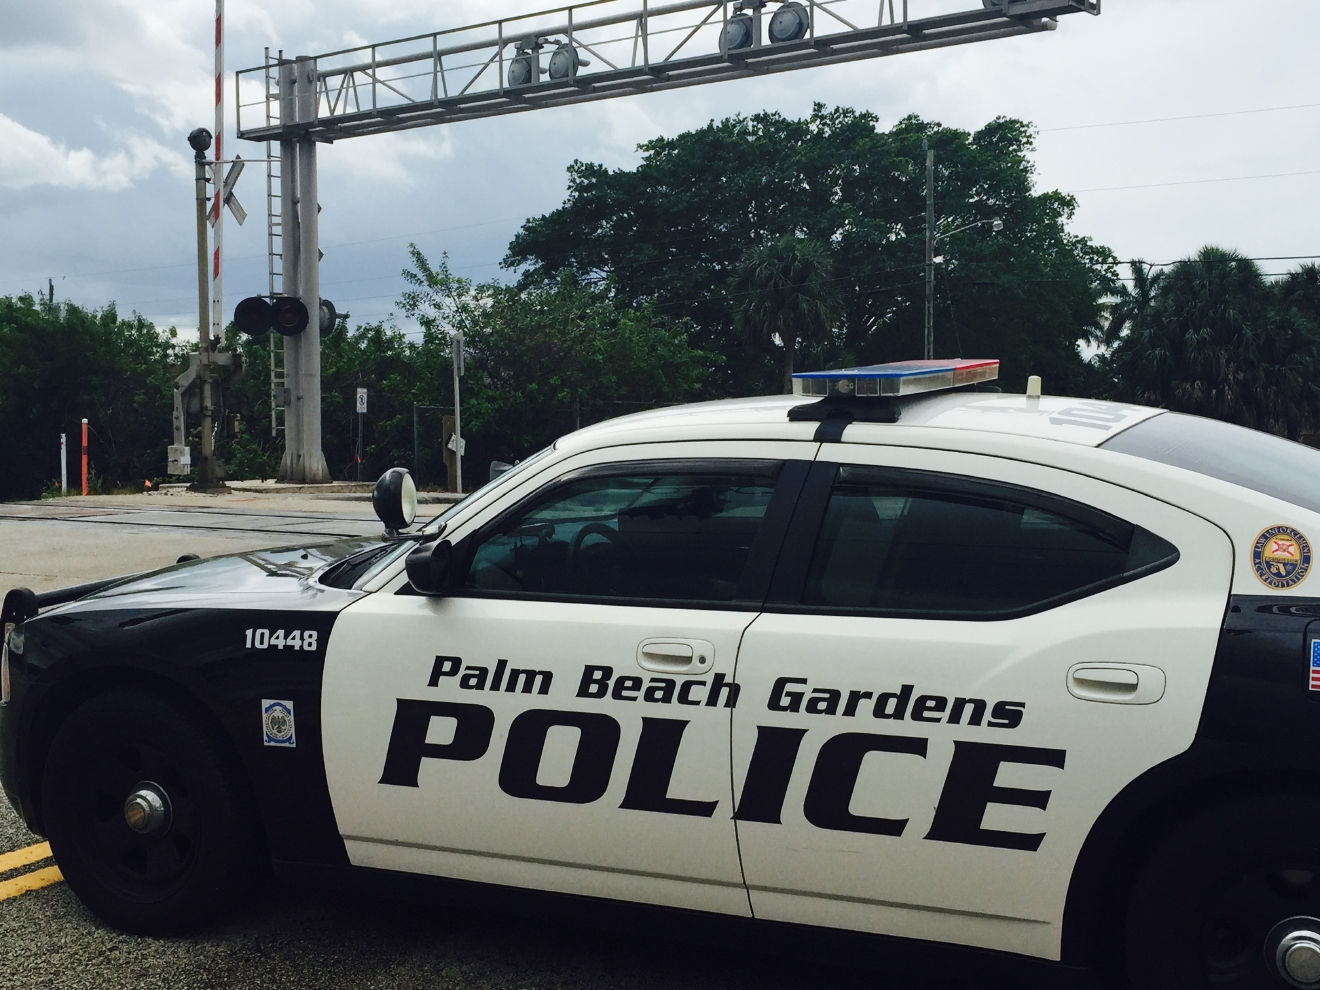 Motorcycle crash driver taken to hospital wpec - Palm beach gardens police department ...